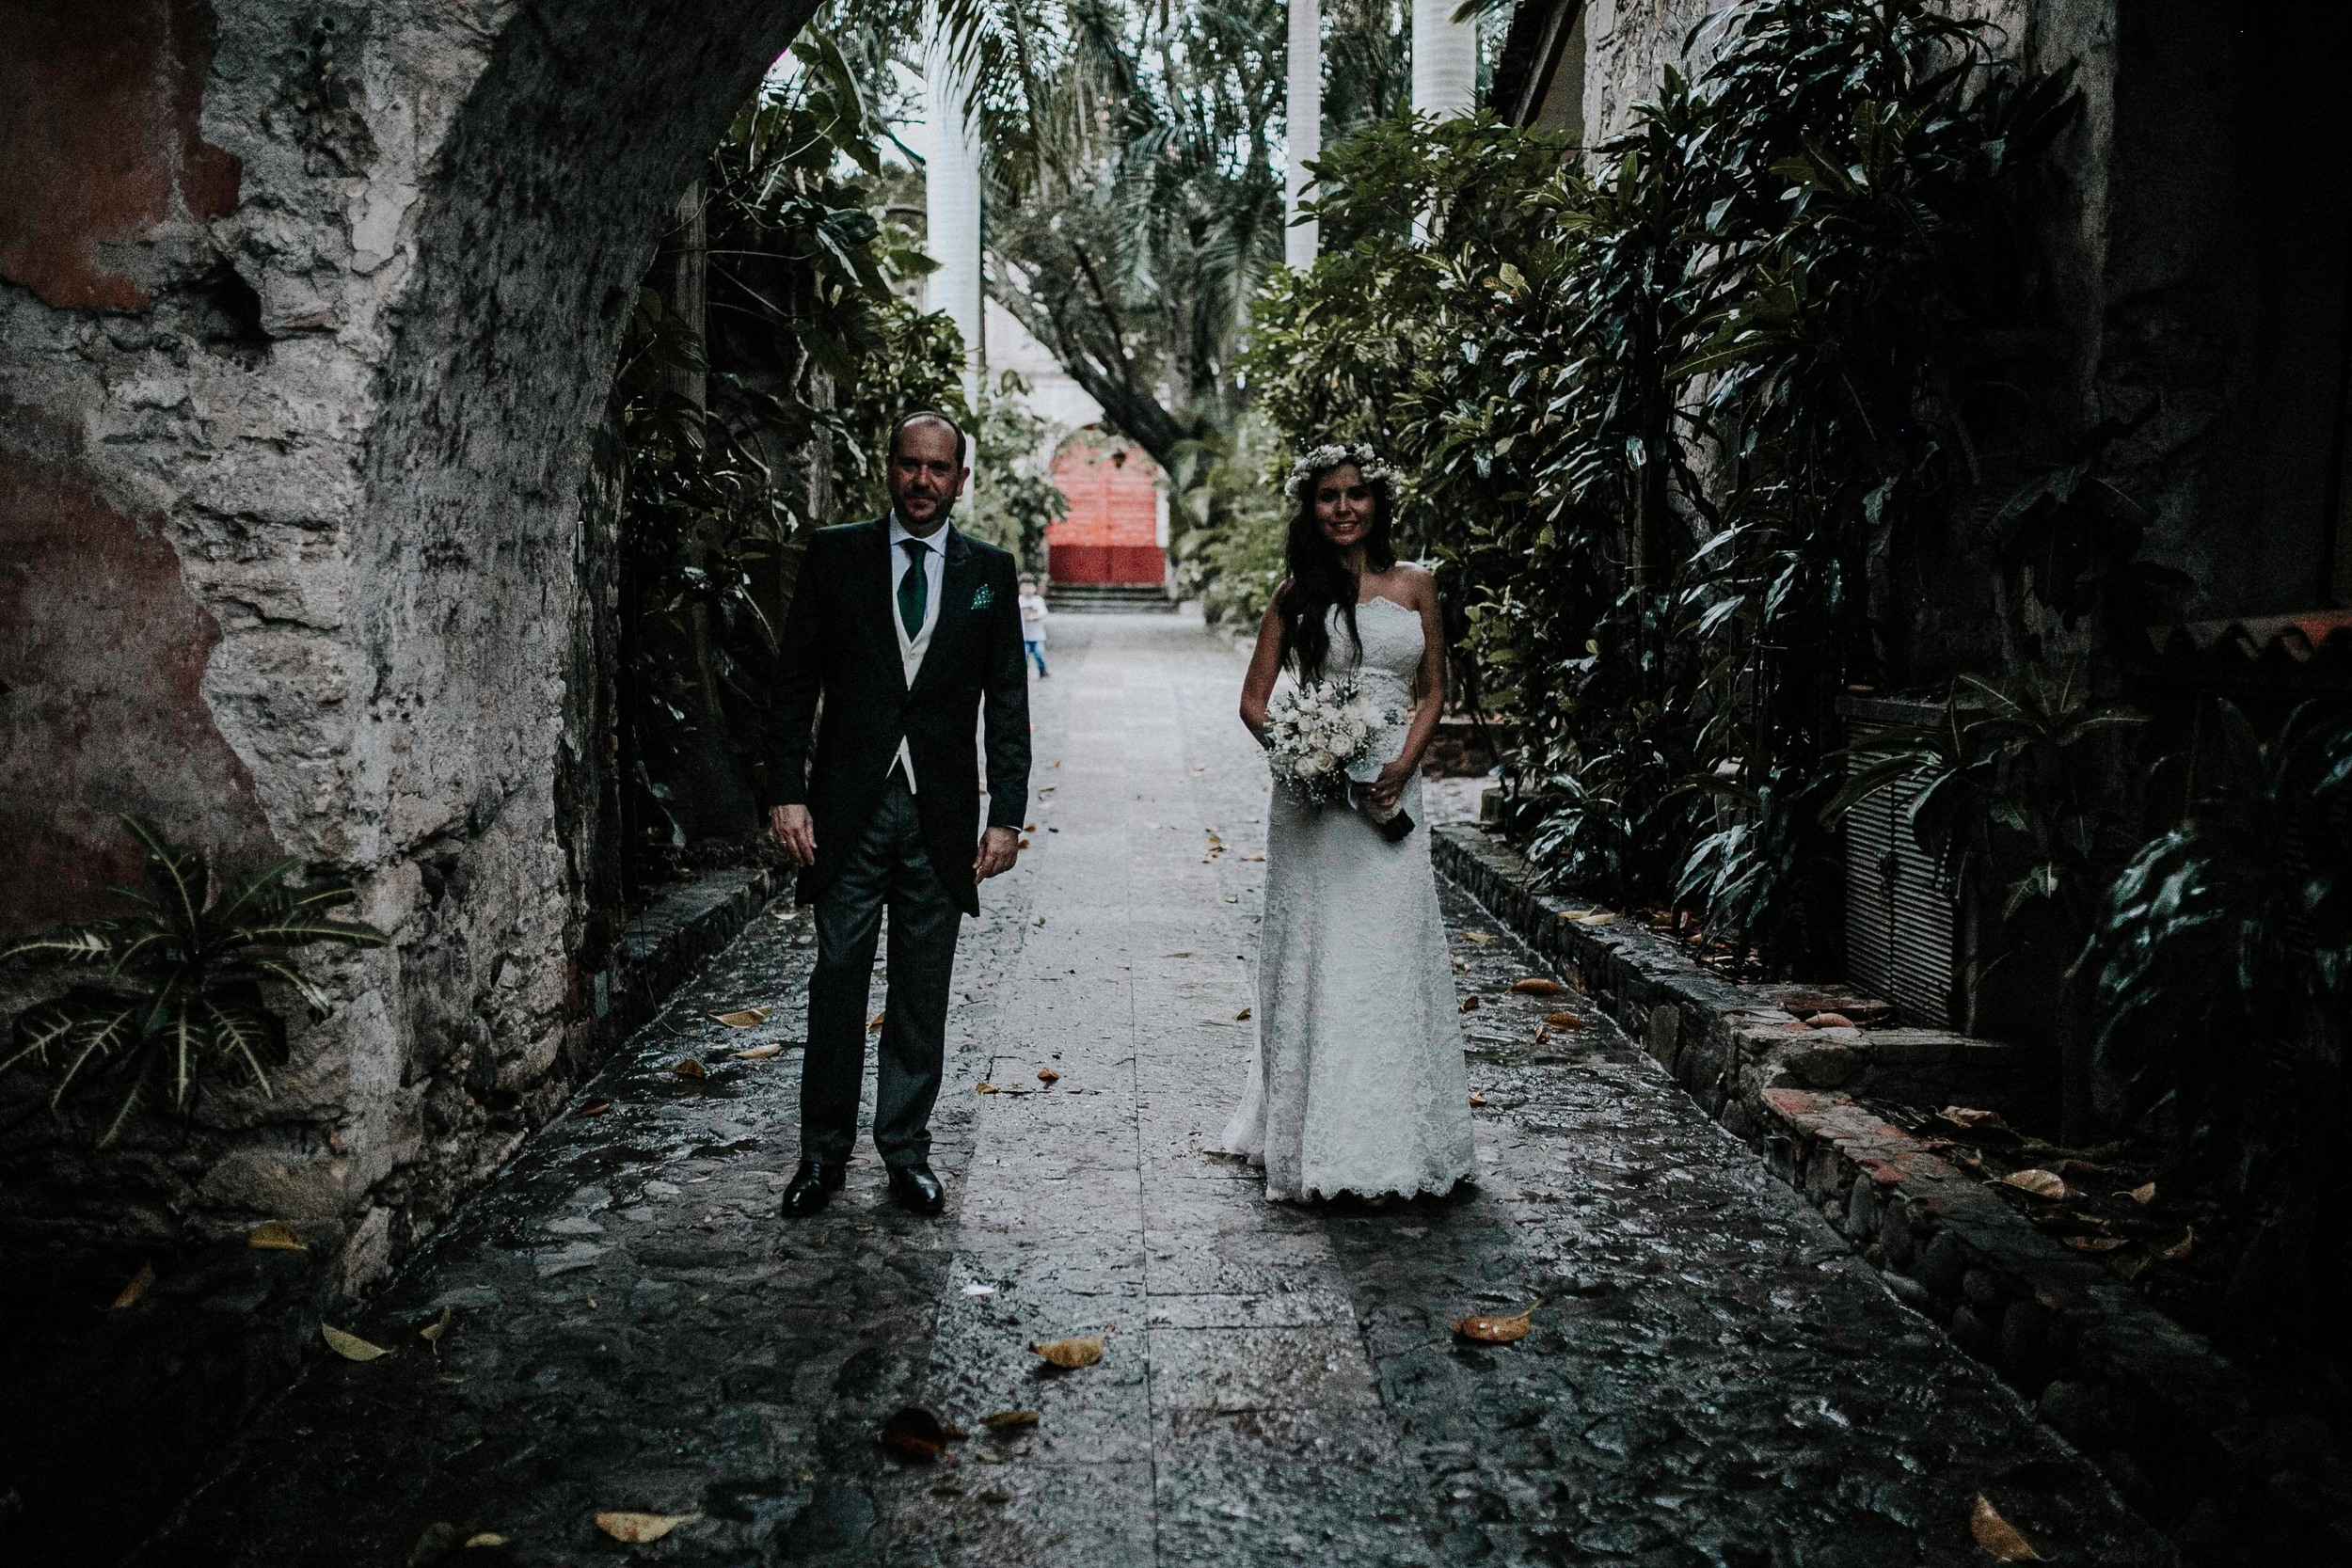 643A2447-Editaralfonso_flores_destination_wedding_photographer_San_gabriel_de_las_palmas.jpg